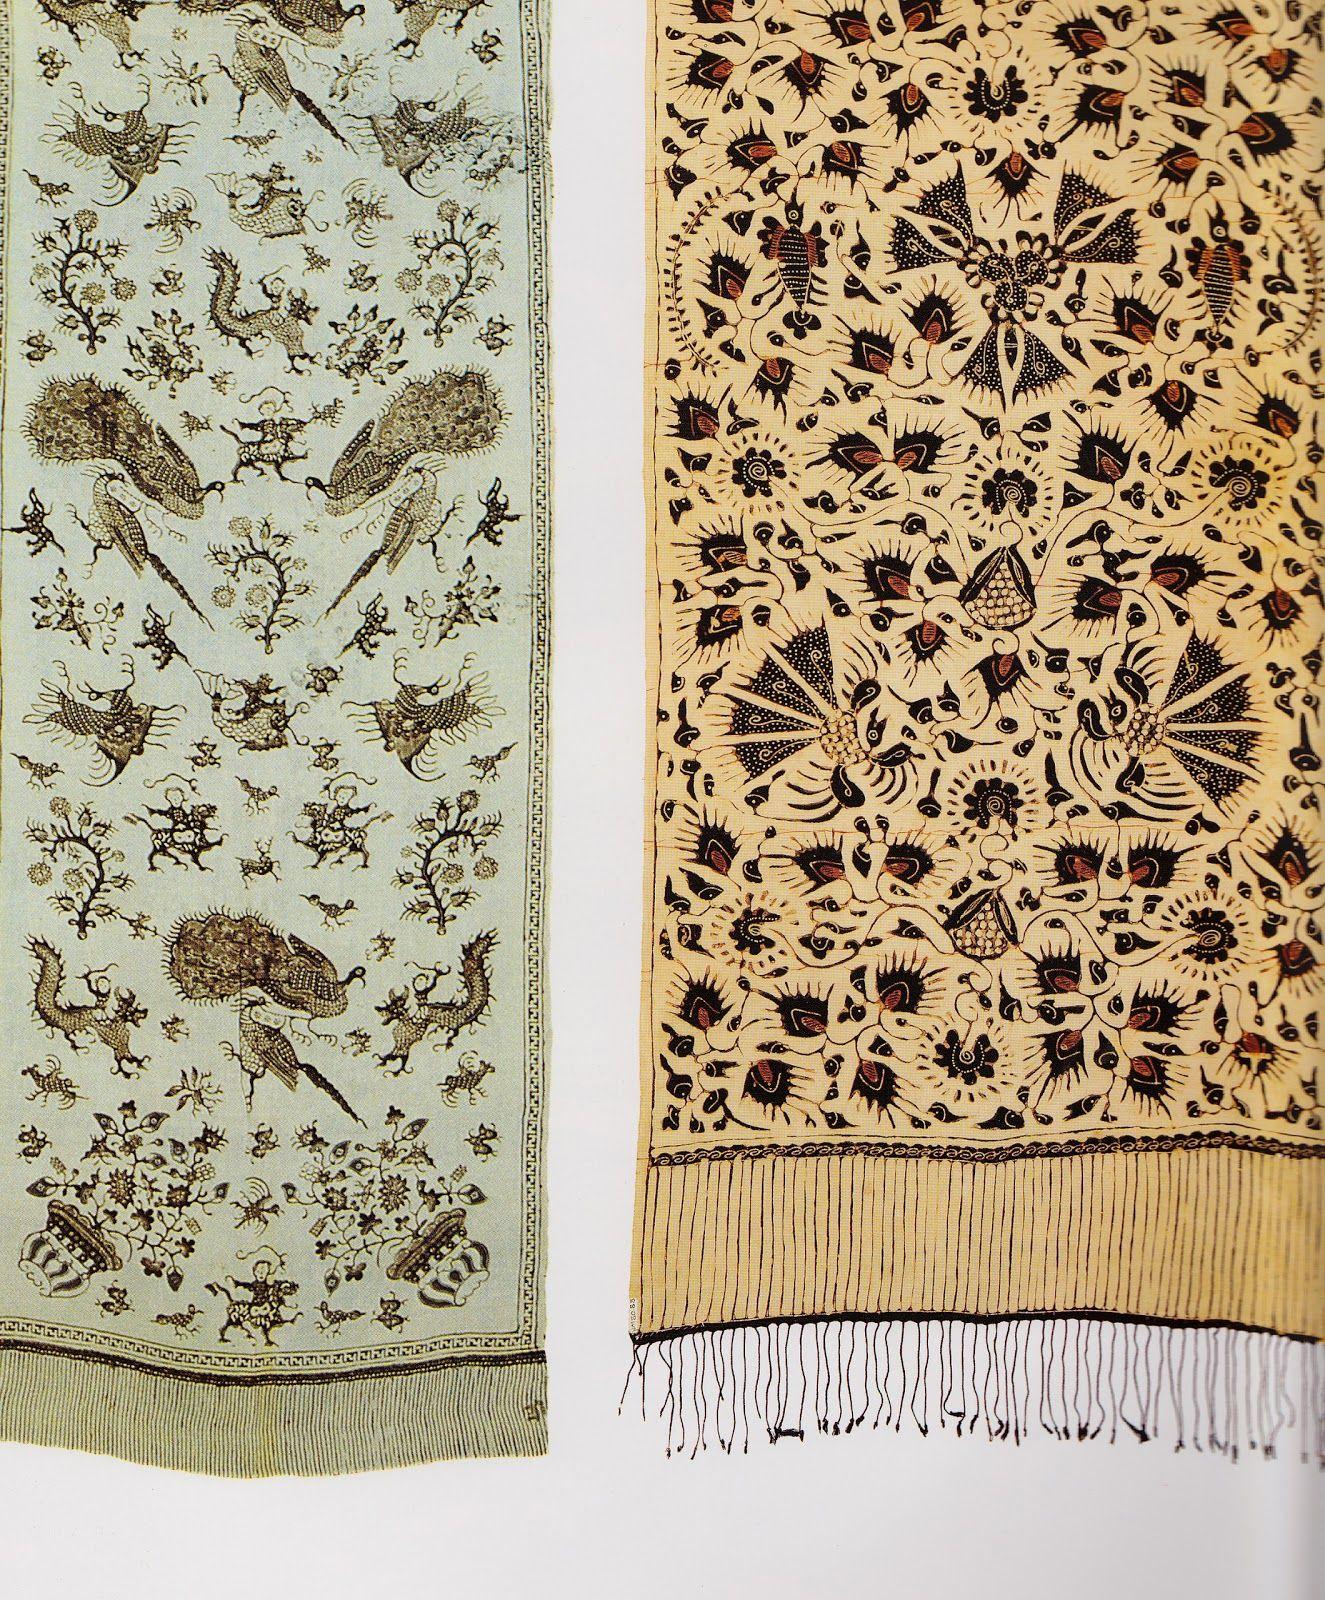 Batik Design By Pepin Van Roojen Shambhala Publications